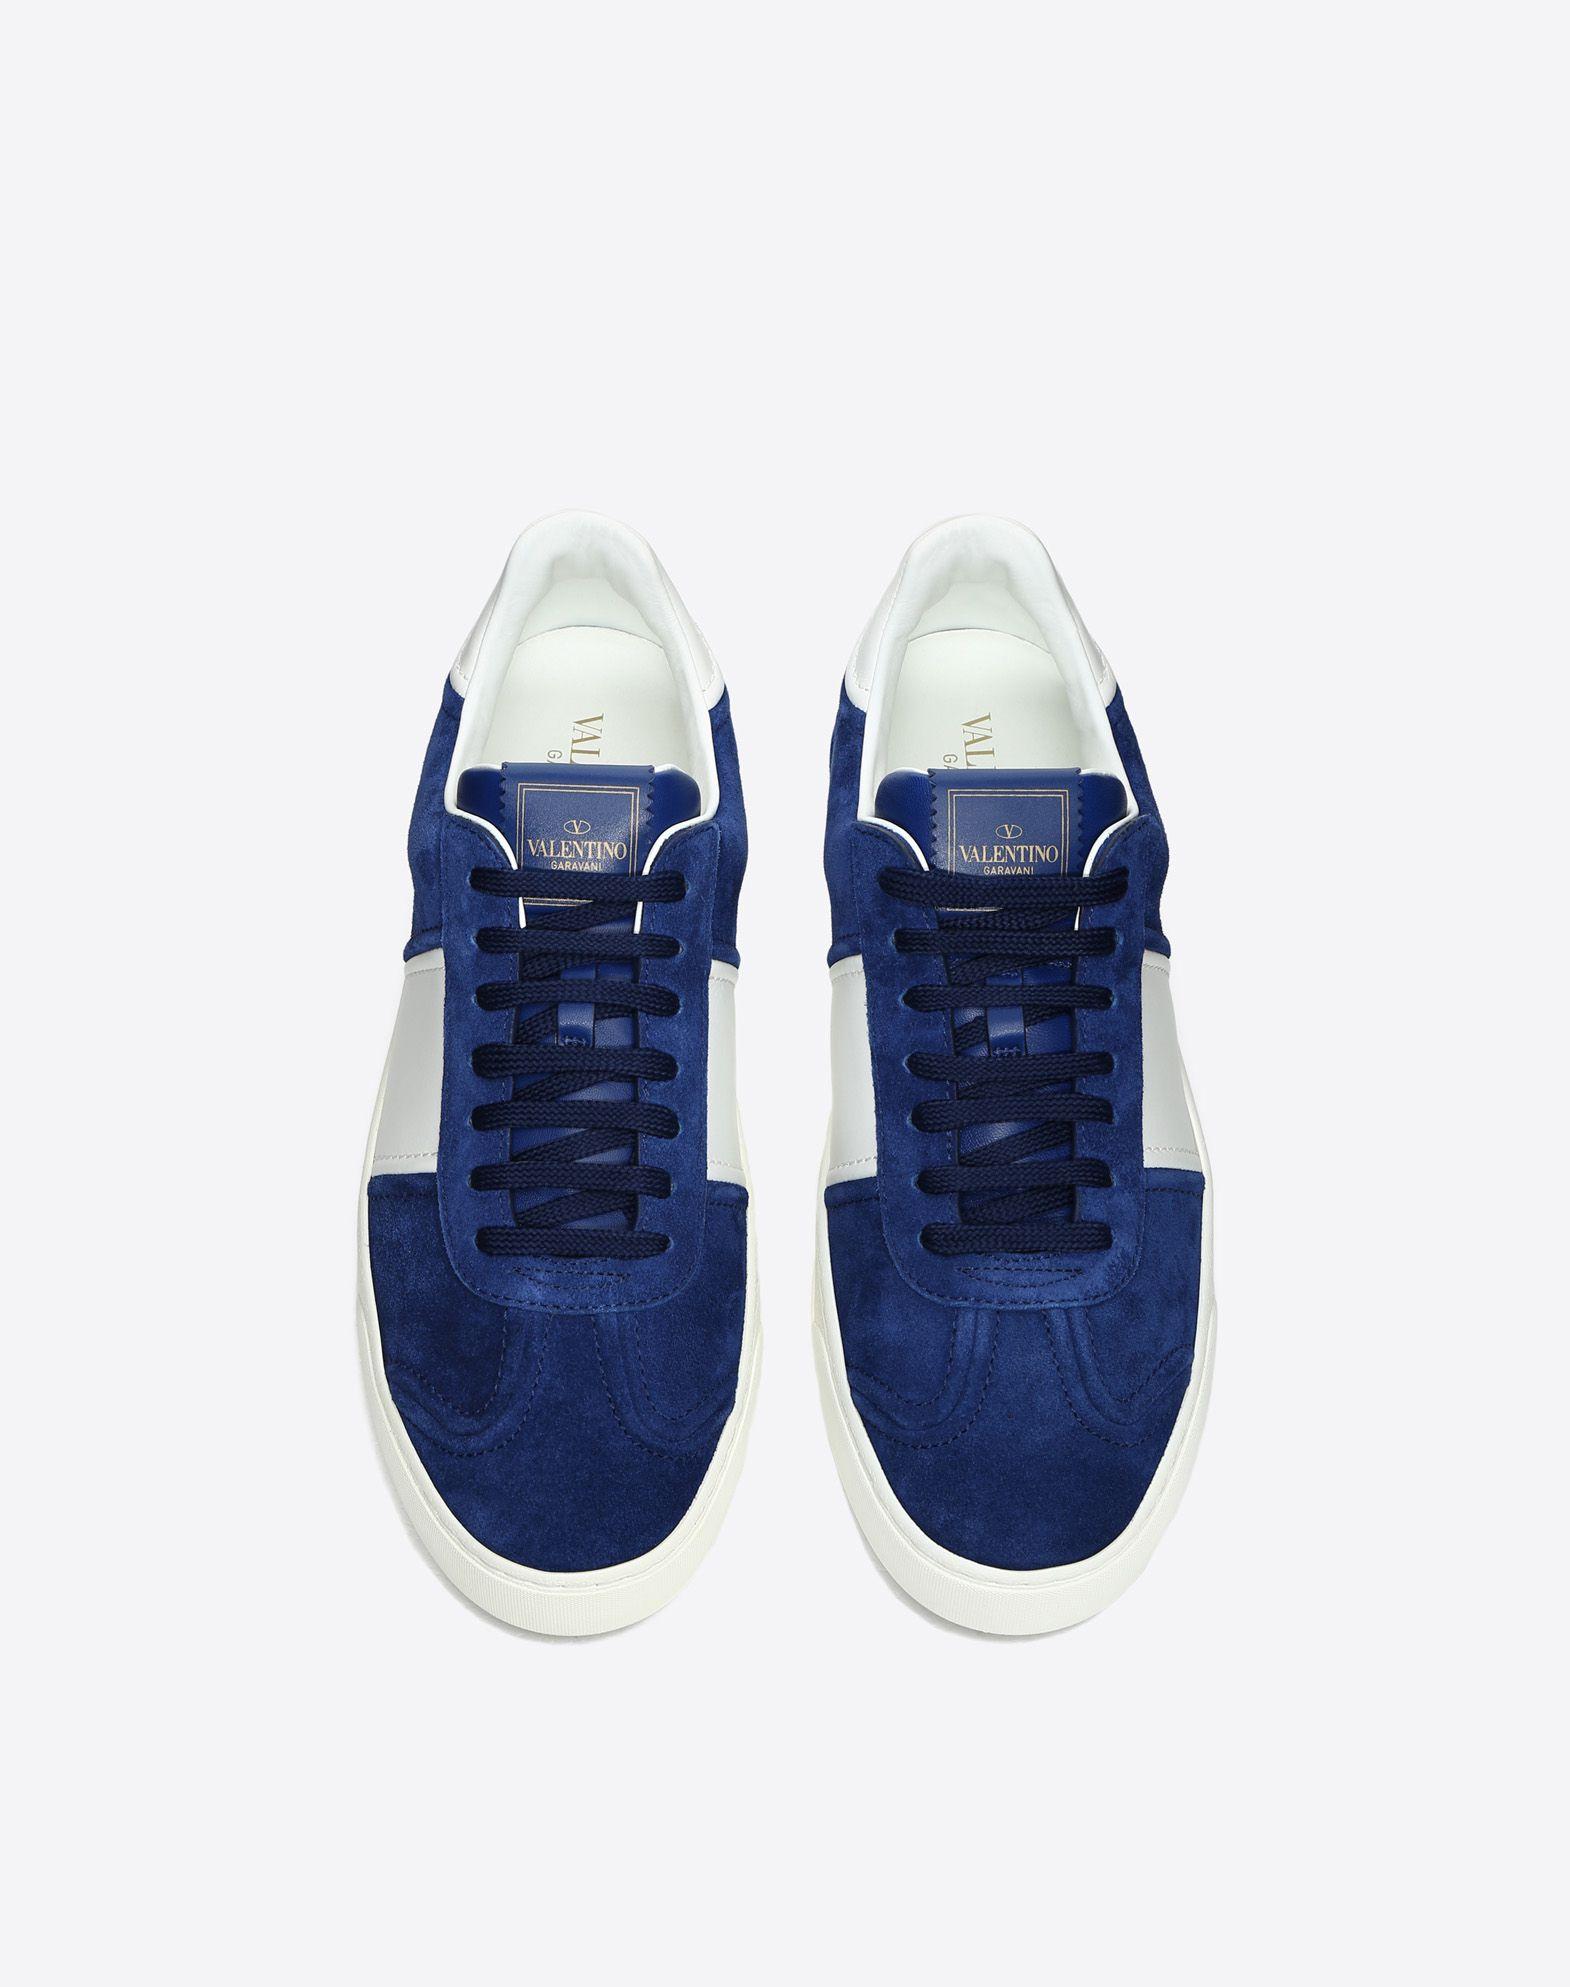 VALENTINO GARAVANI UOMO Flycrew Sneakers  LOW-TOP SNEAKERS U e